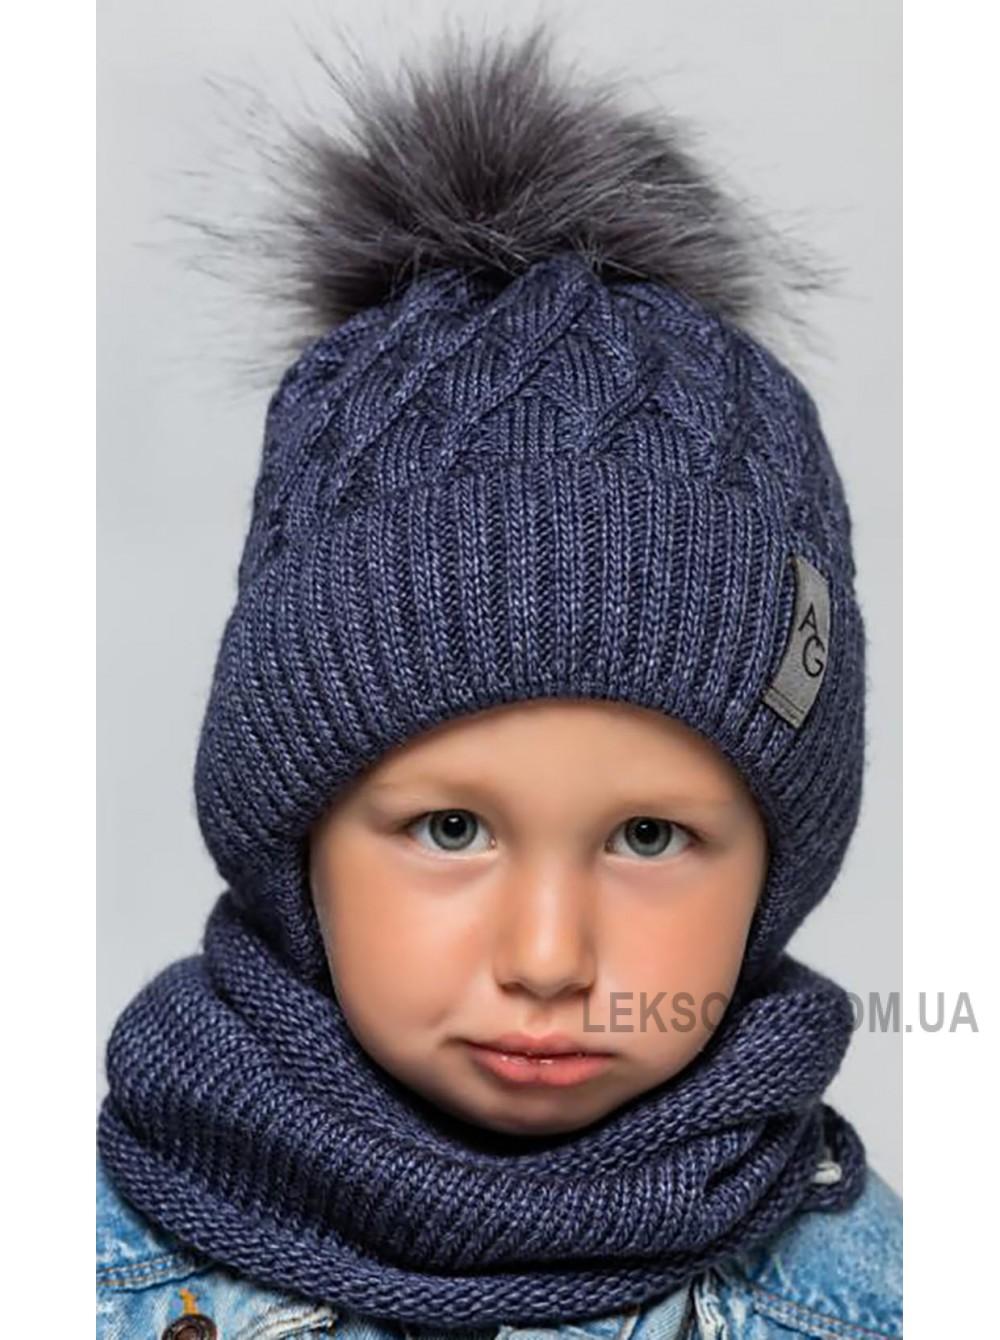 Детская вязаная шапка D619295-46-50 Марк